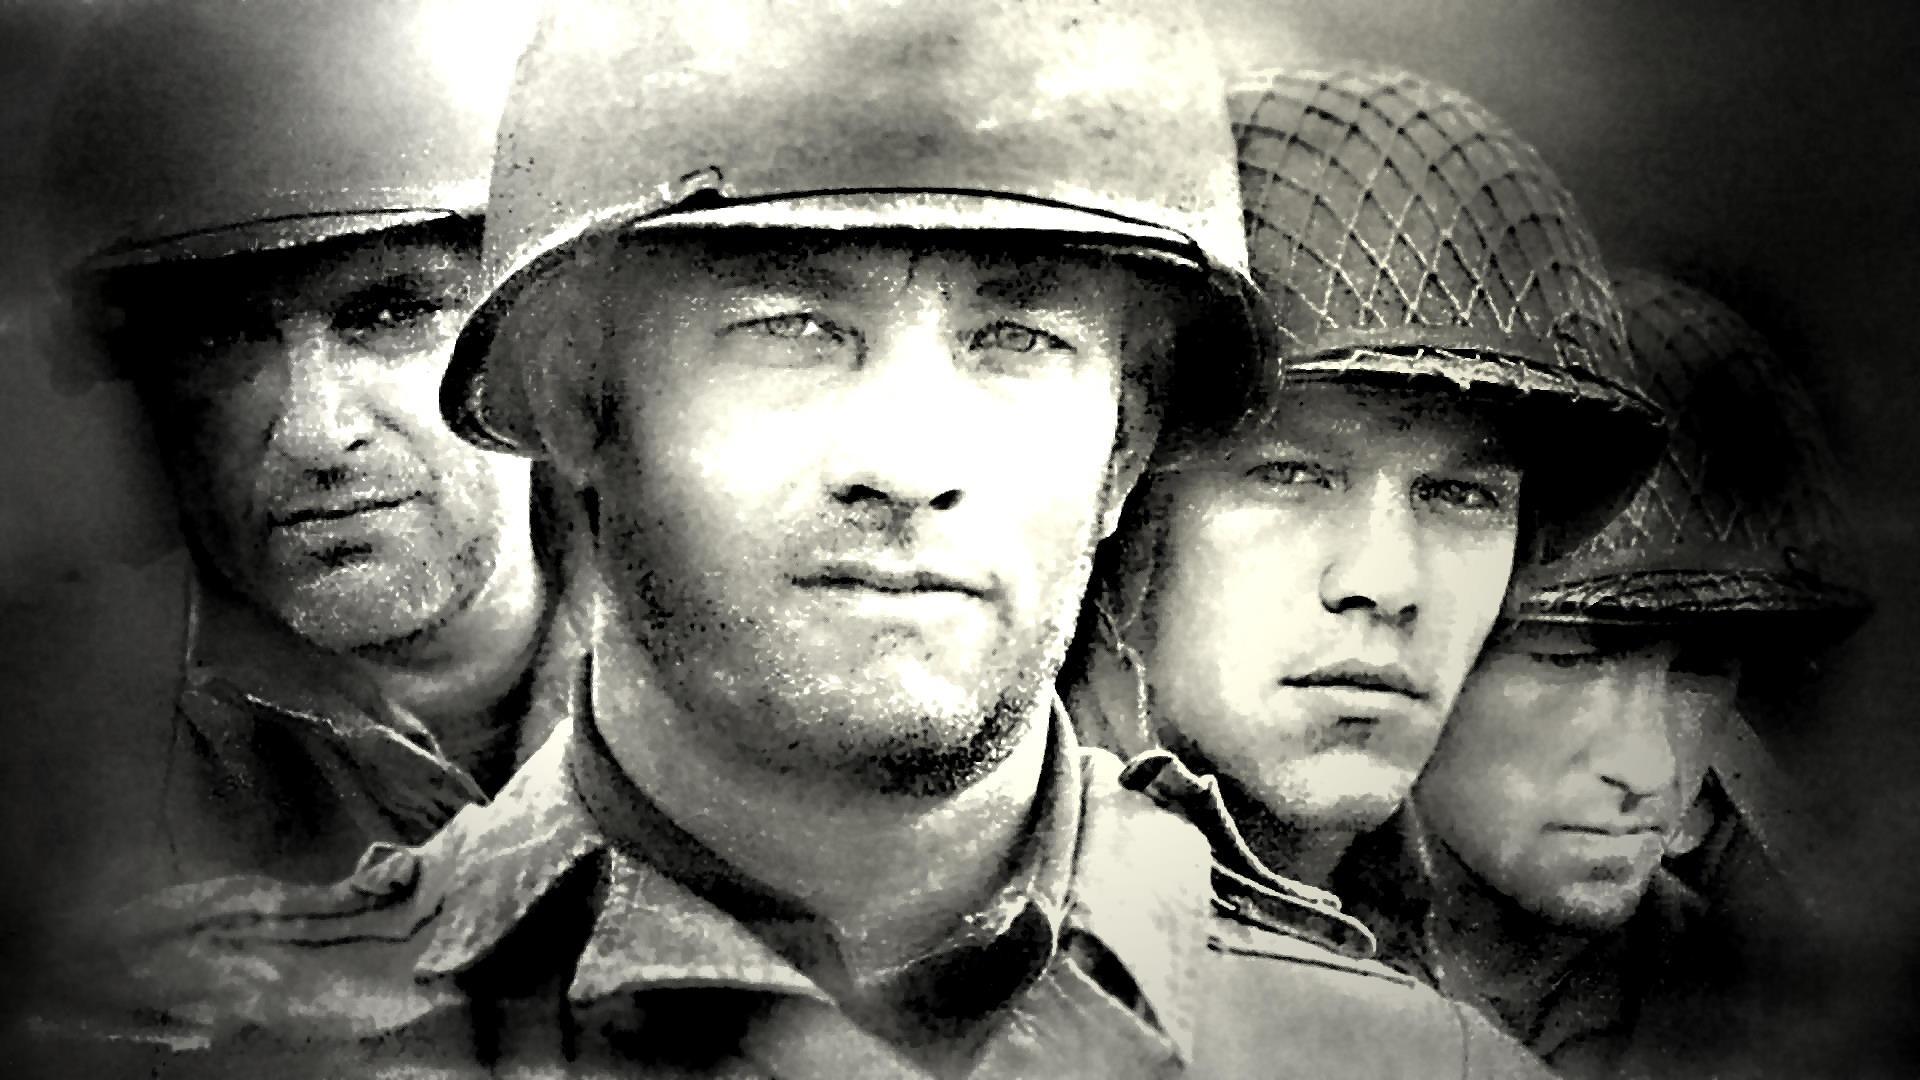 War Quote Wallpaper Hd Saving Private Ryan 1998 Tom Hanks Matt Damon